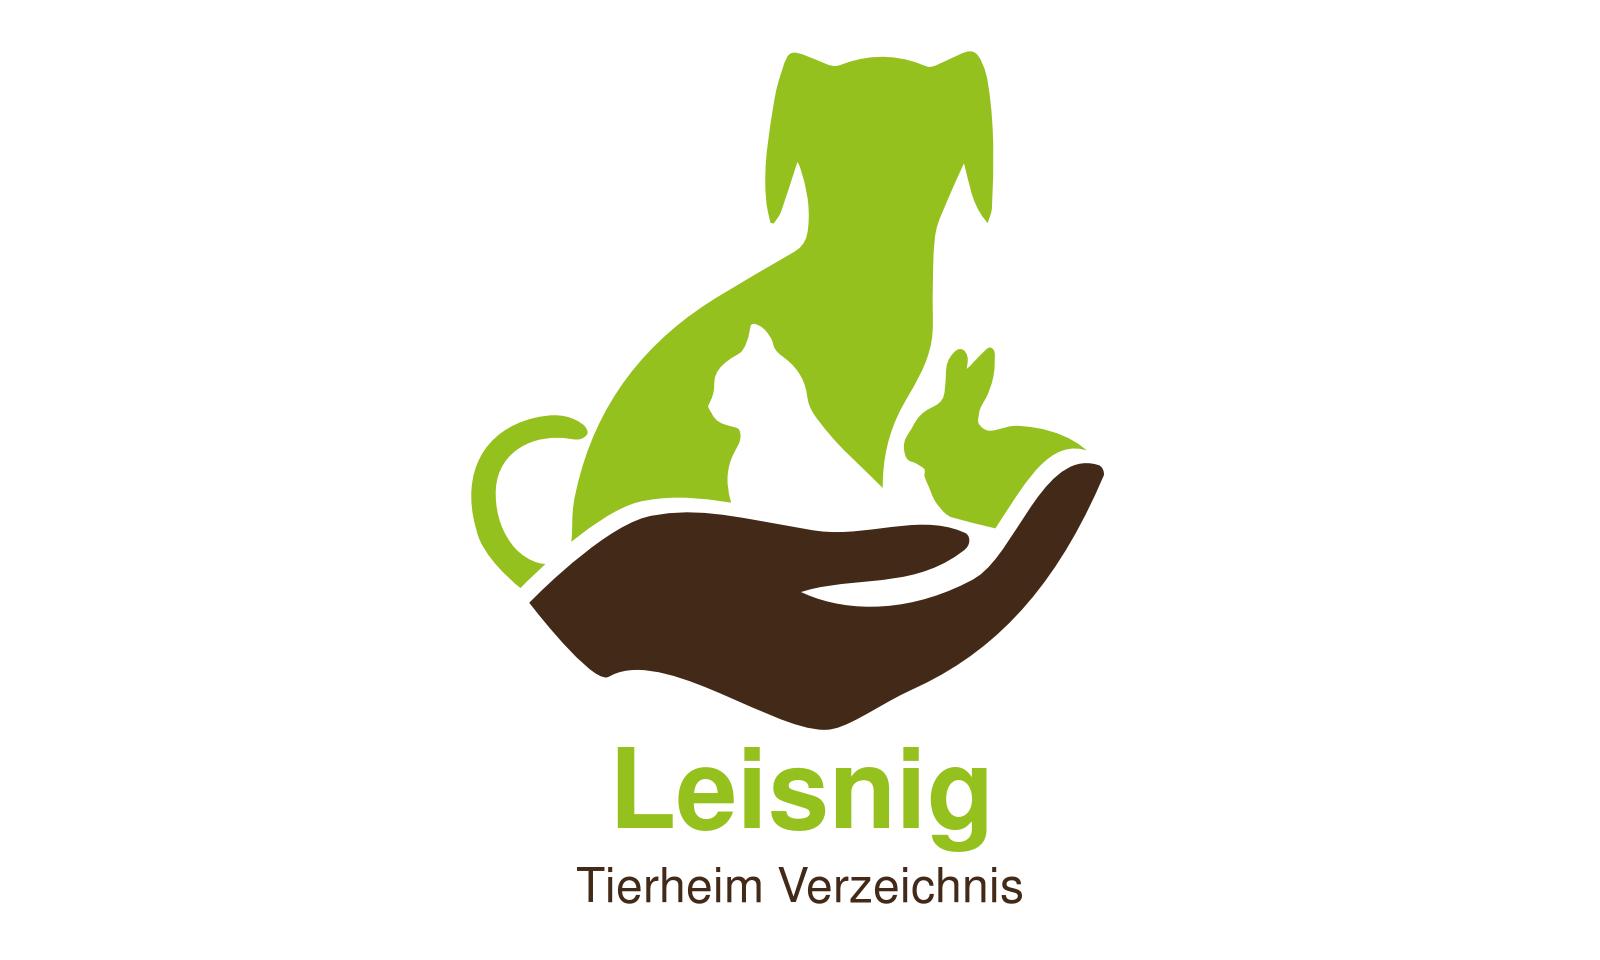 Tierheim Leisnig